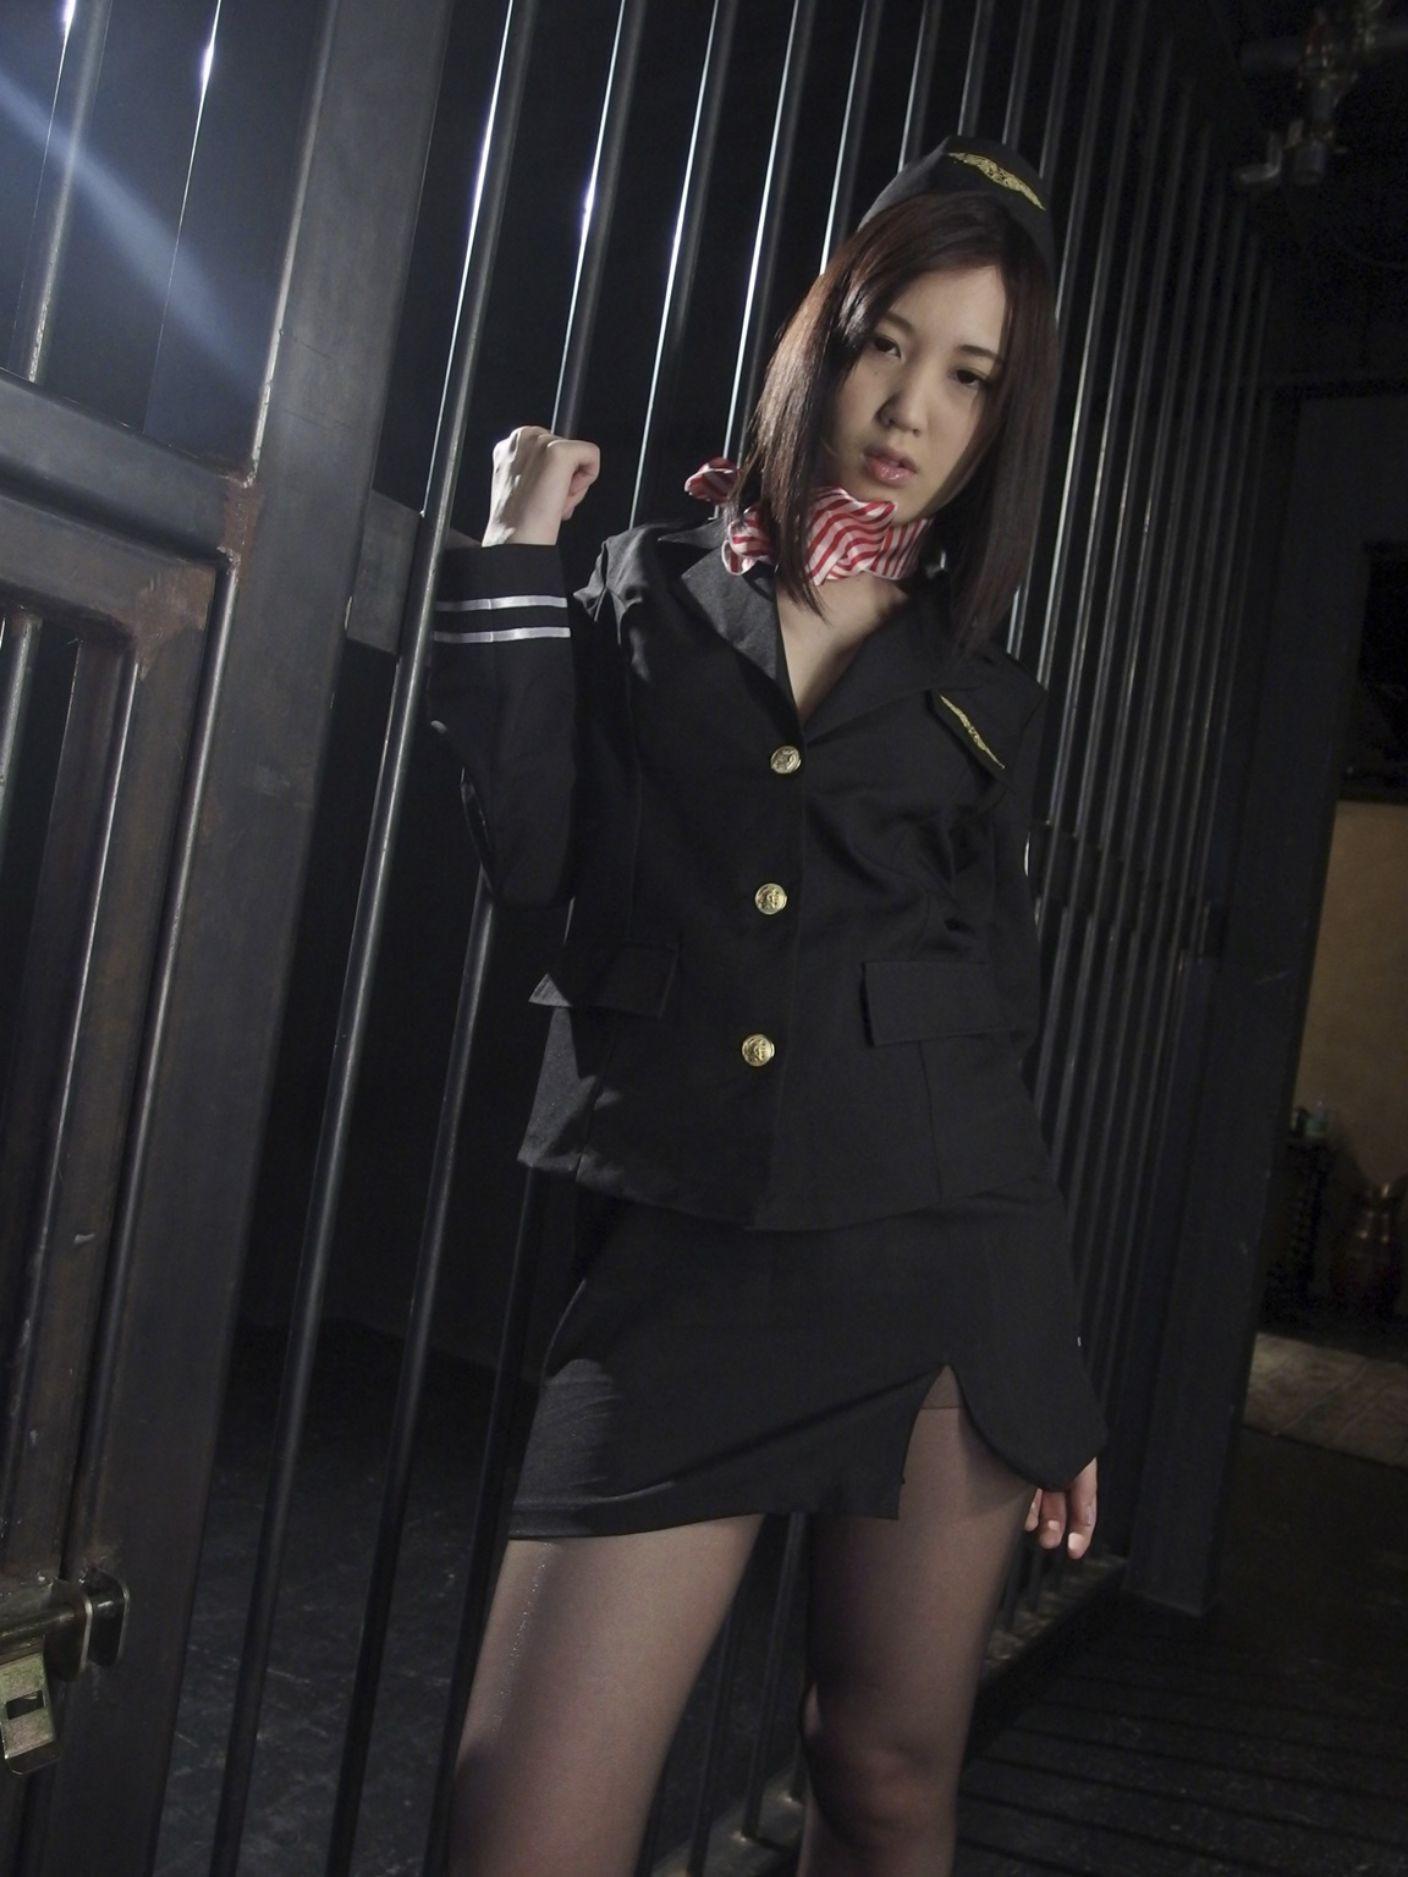 COSPLAY GIRLS 白石優杞菜 (MAXING美少女写真集)036